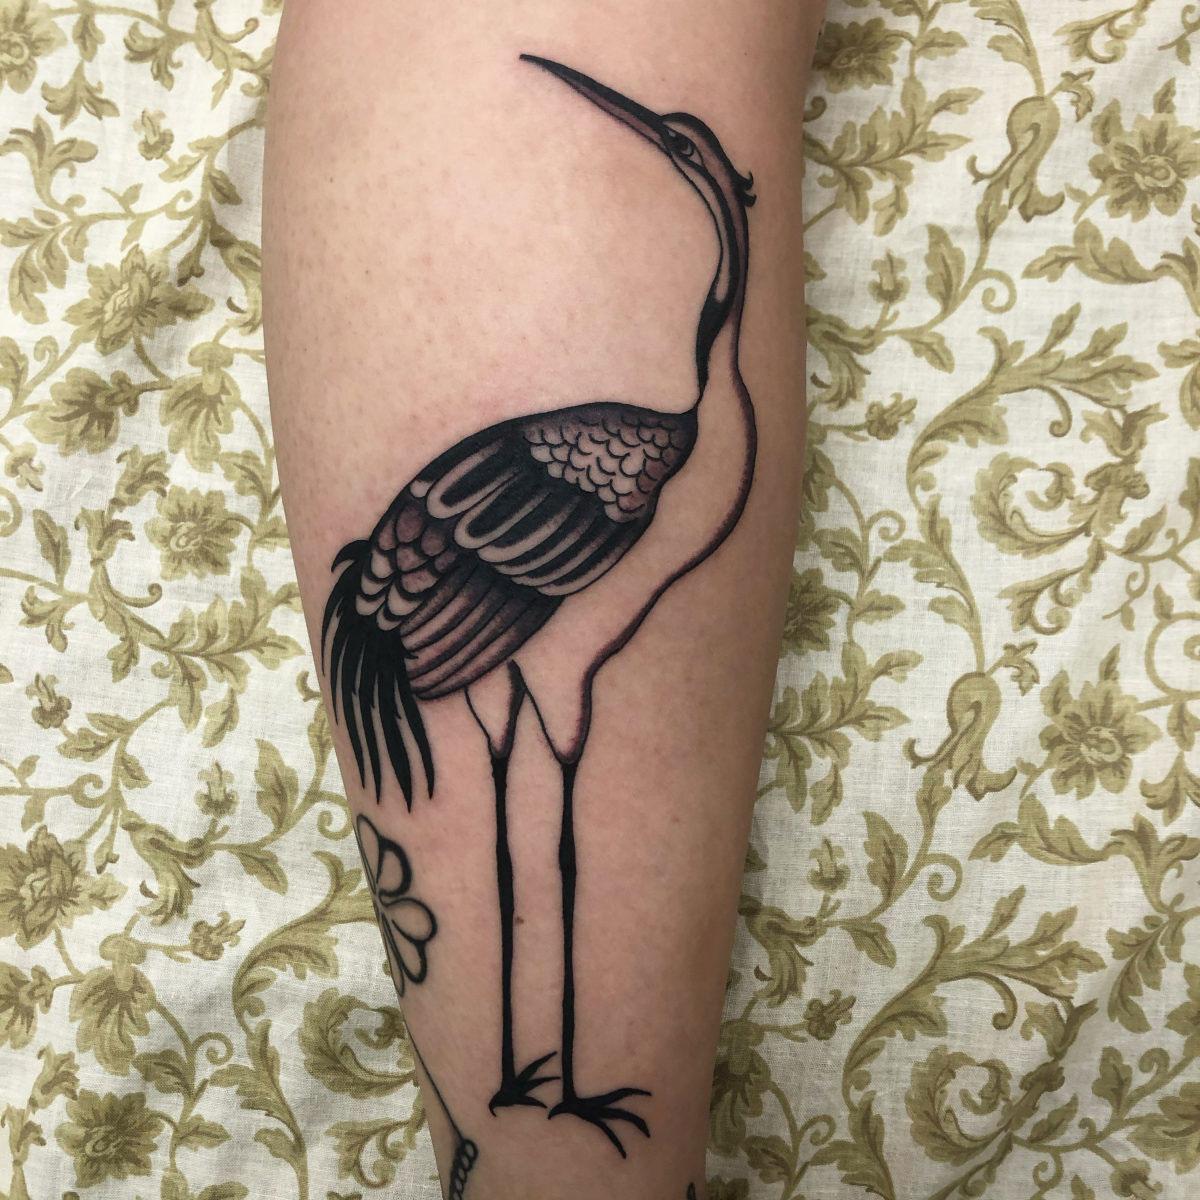 blackwork-tattoo